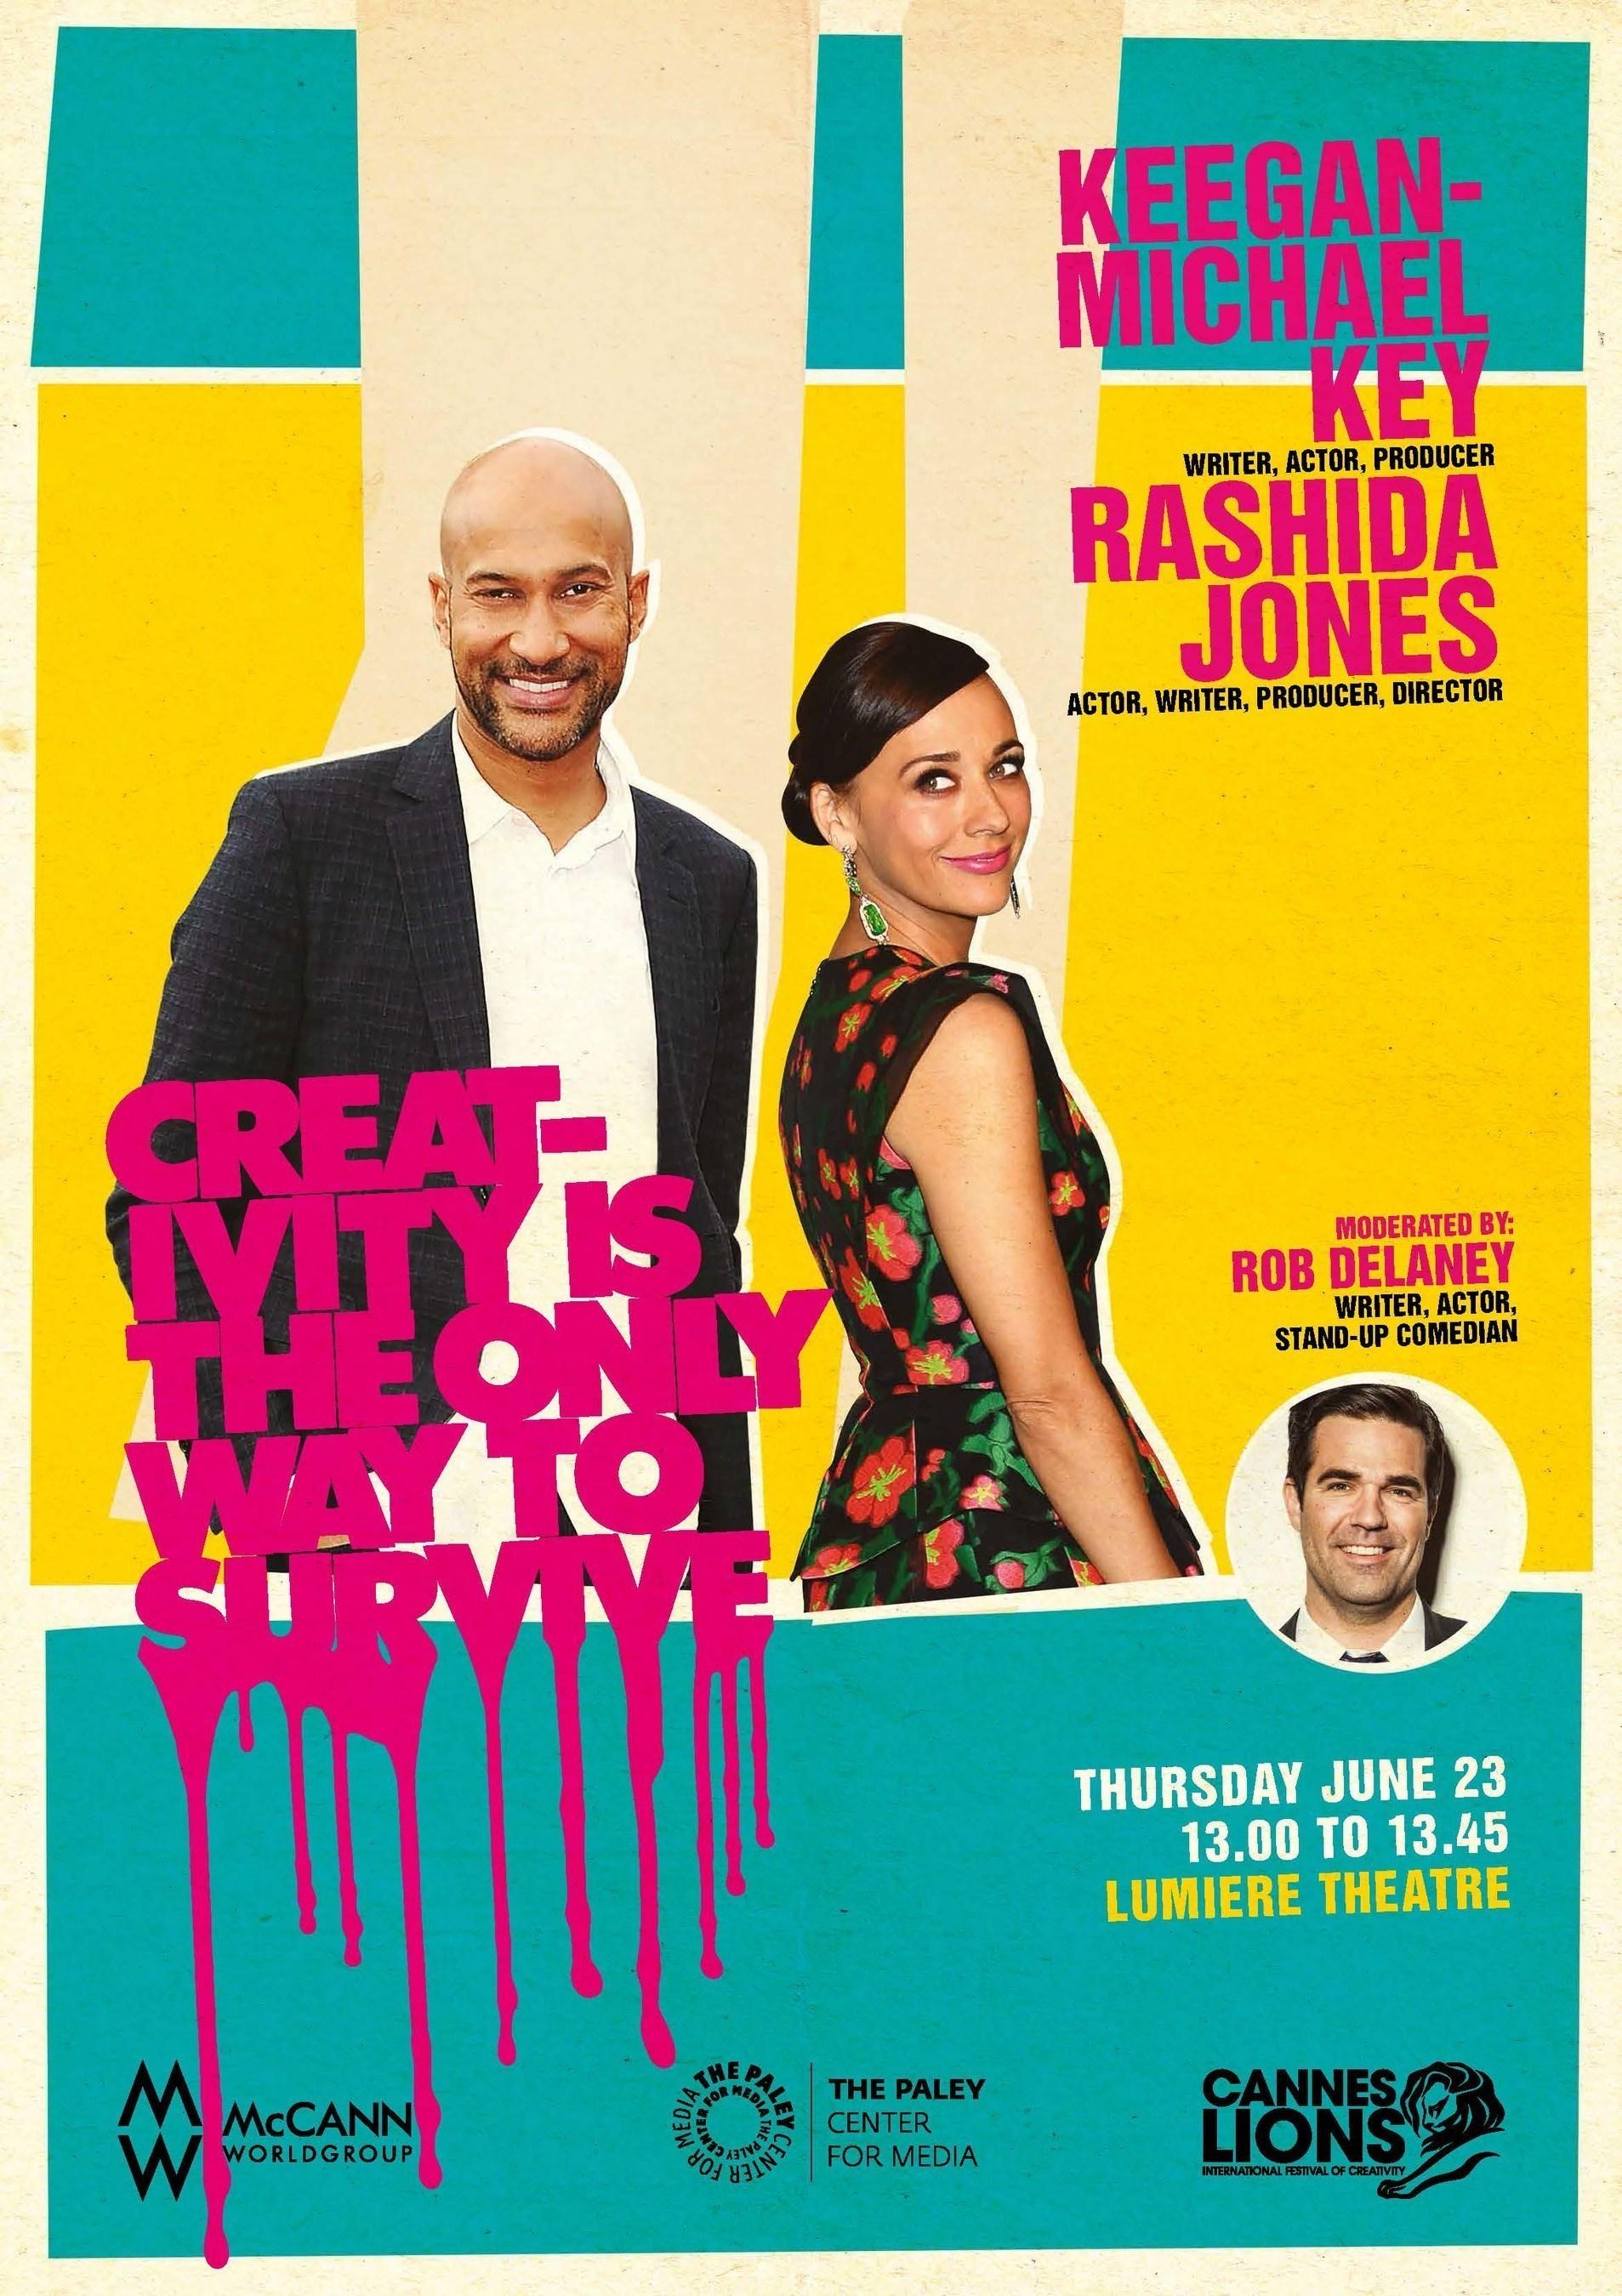 Comedy All-Stars Rashida Jones, Keegan-Michael Key, and Rob Delaney to Appear at the 2016 Cannes Lions Festival